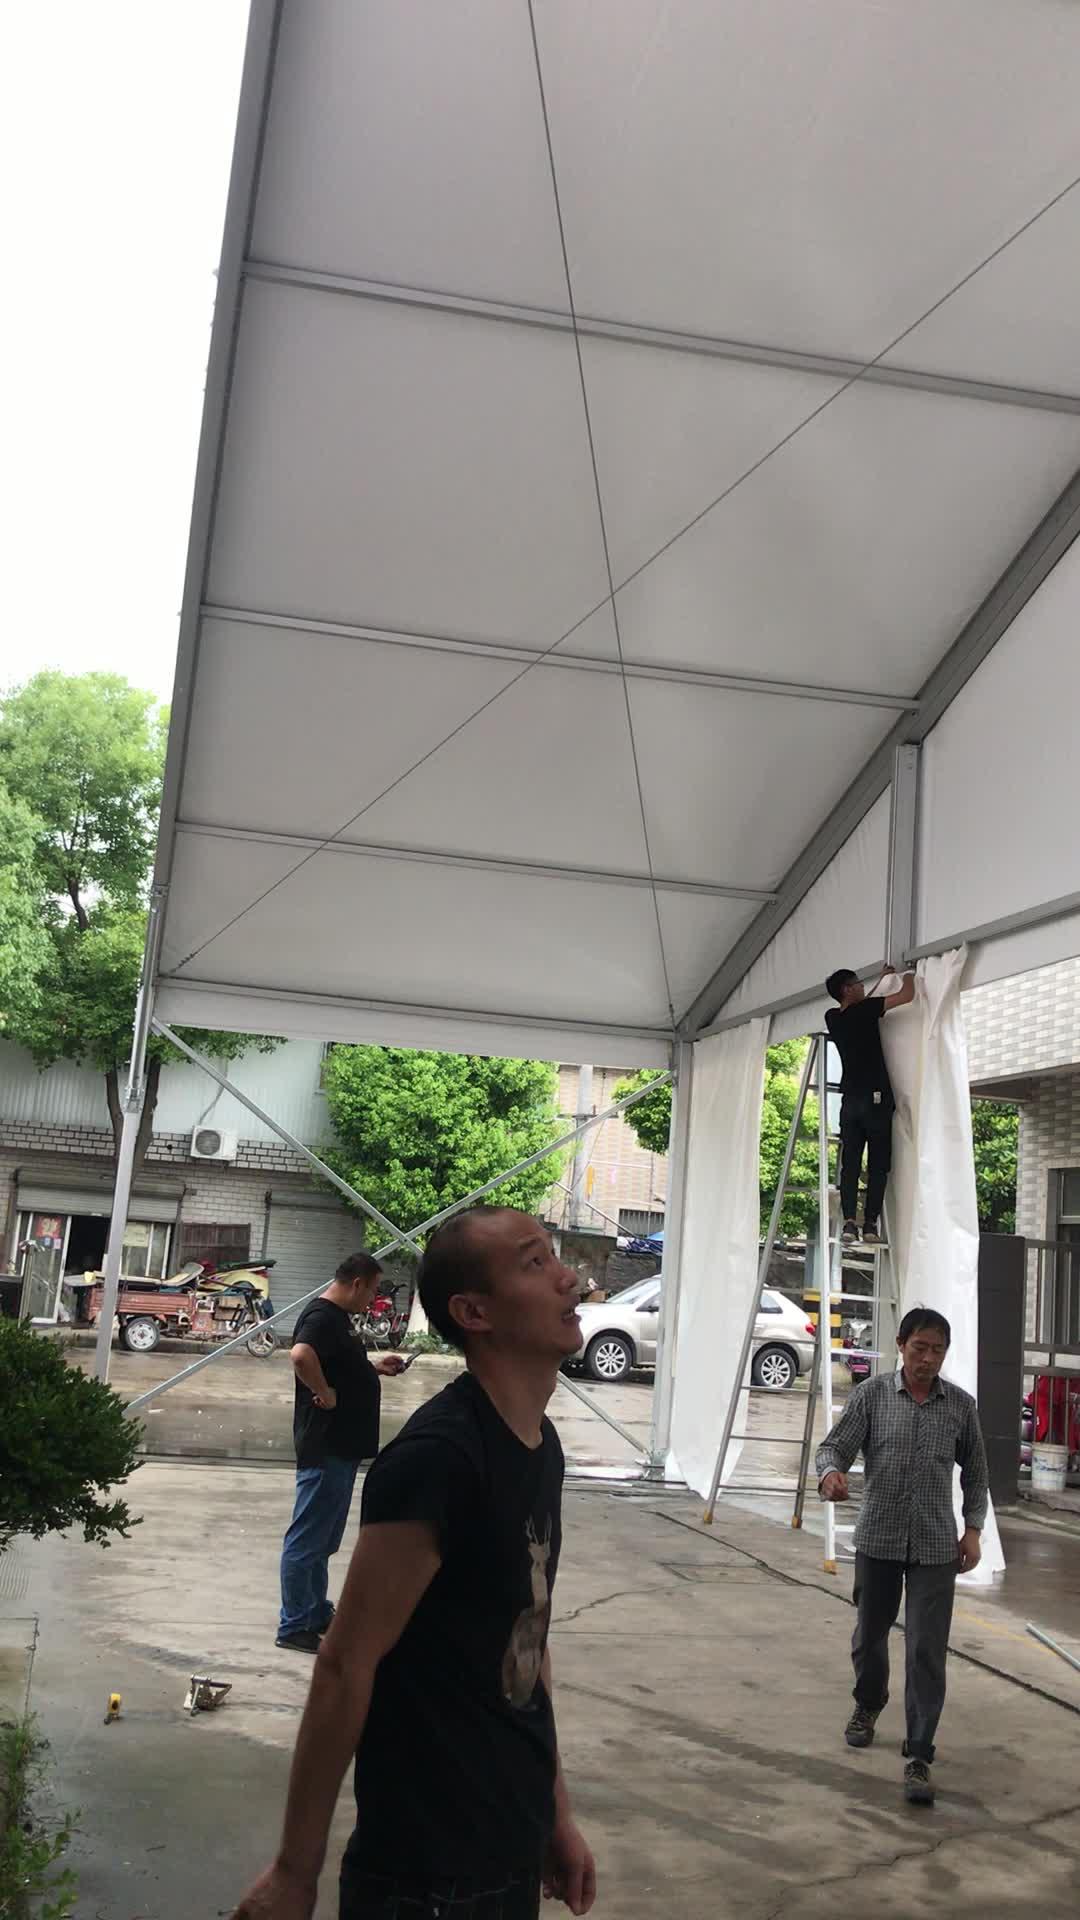 סין יצרן זול מחיר 20x50 m PVC כיסוי קבוע מחסן אחסון אוהל